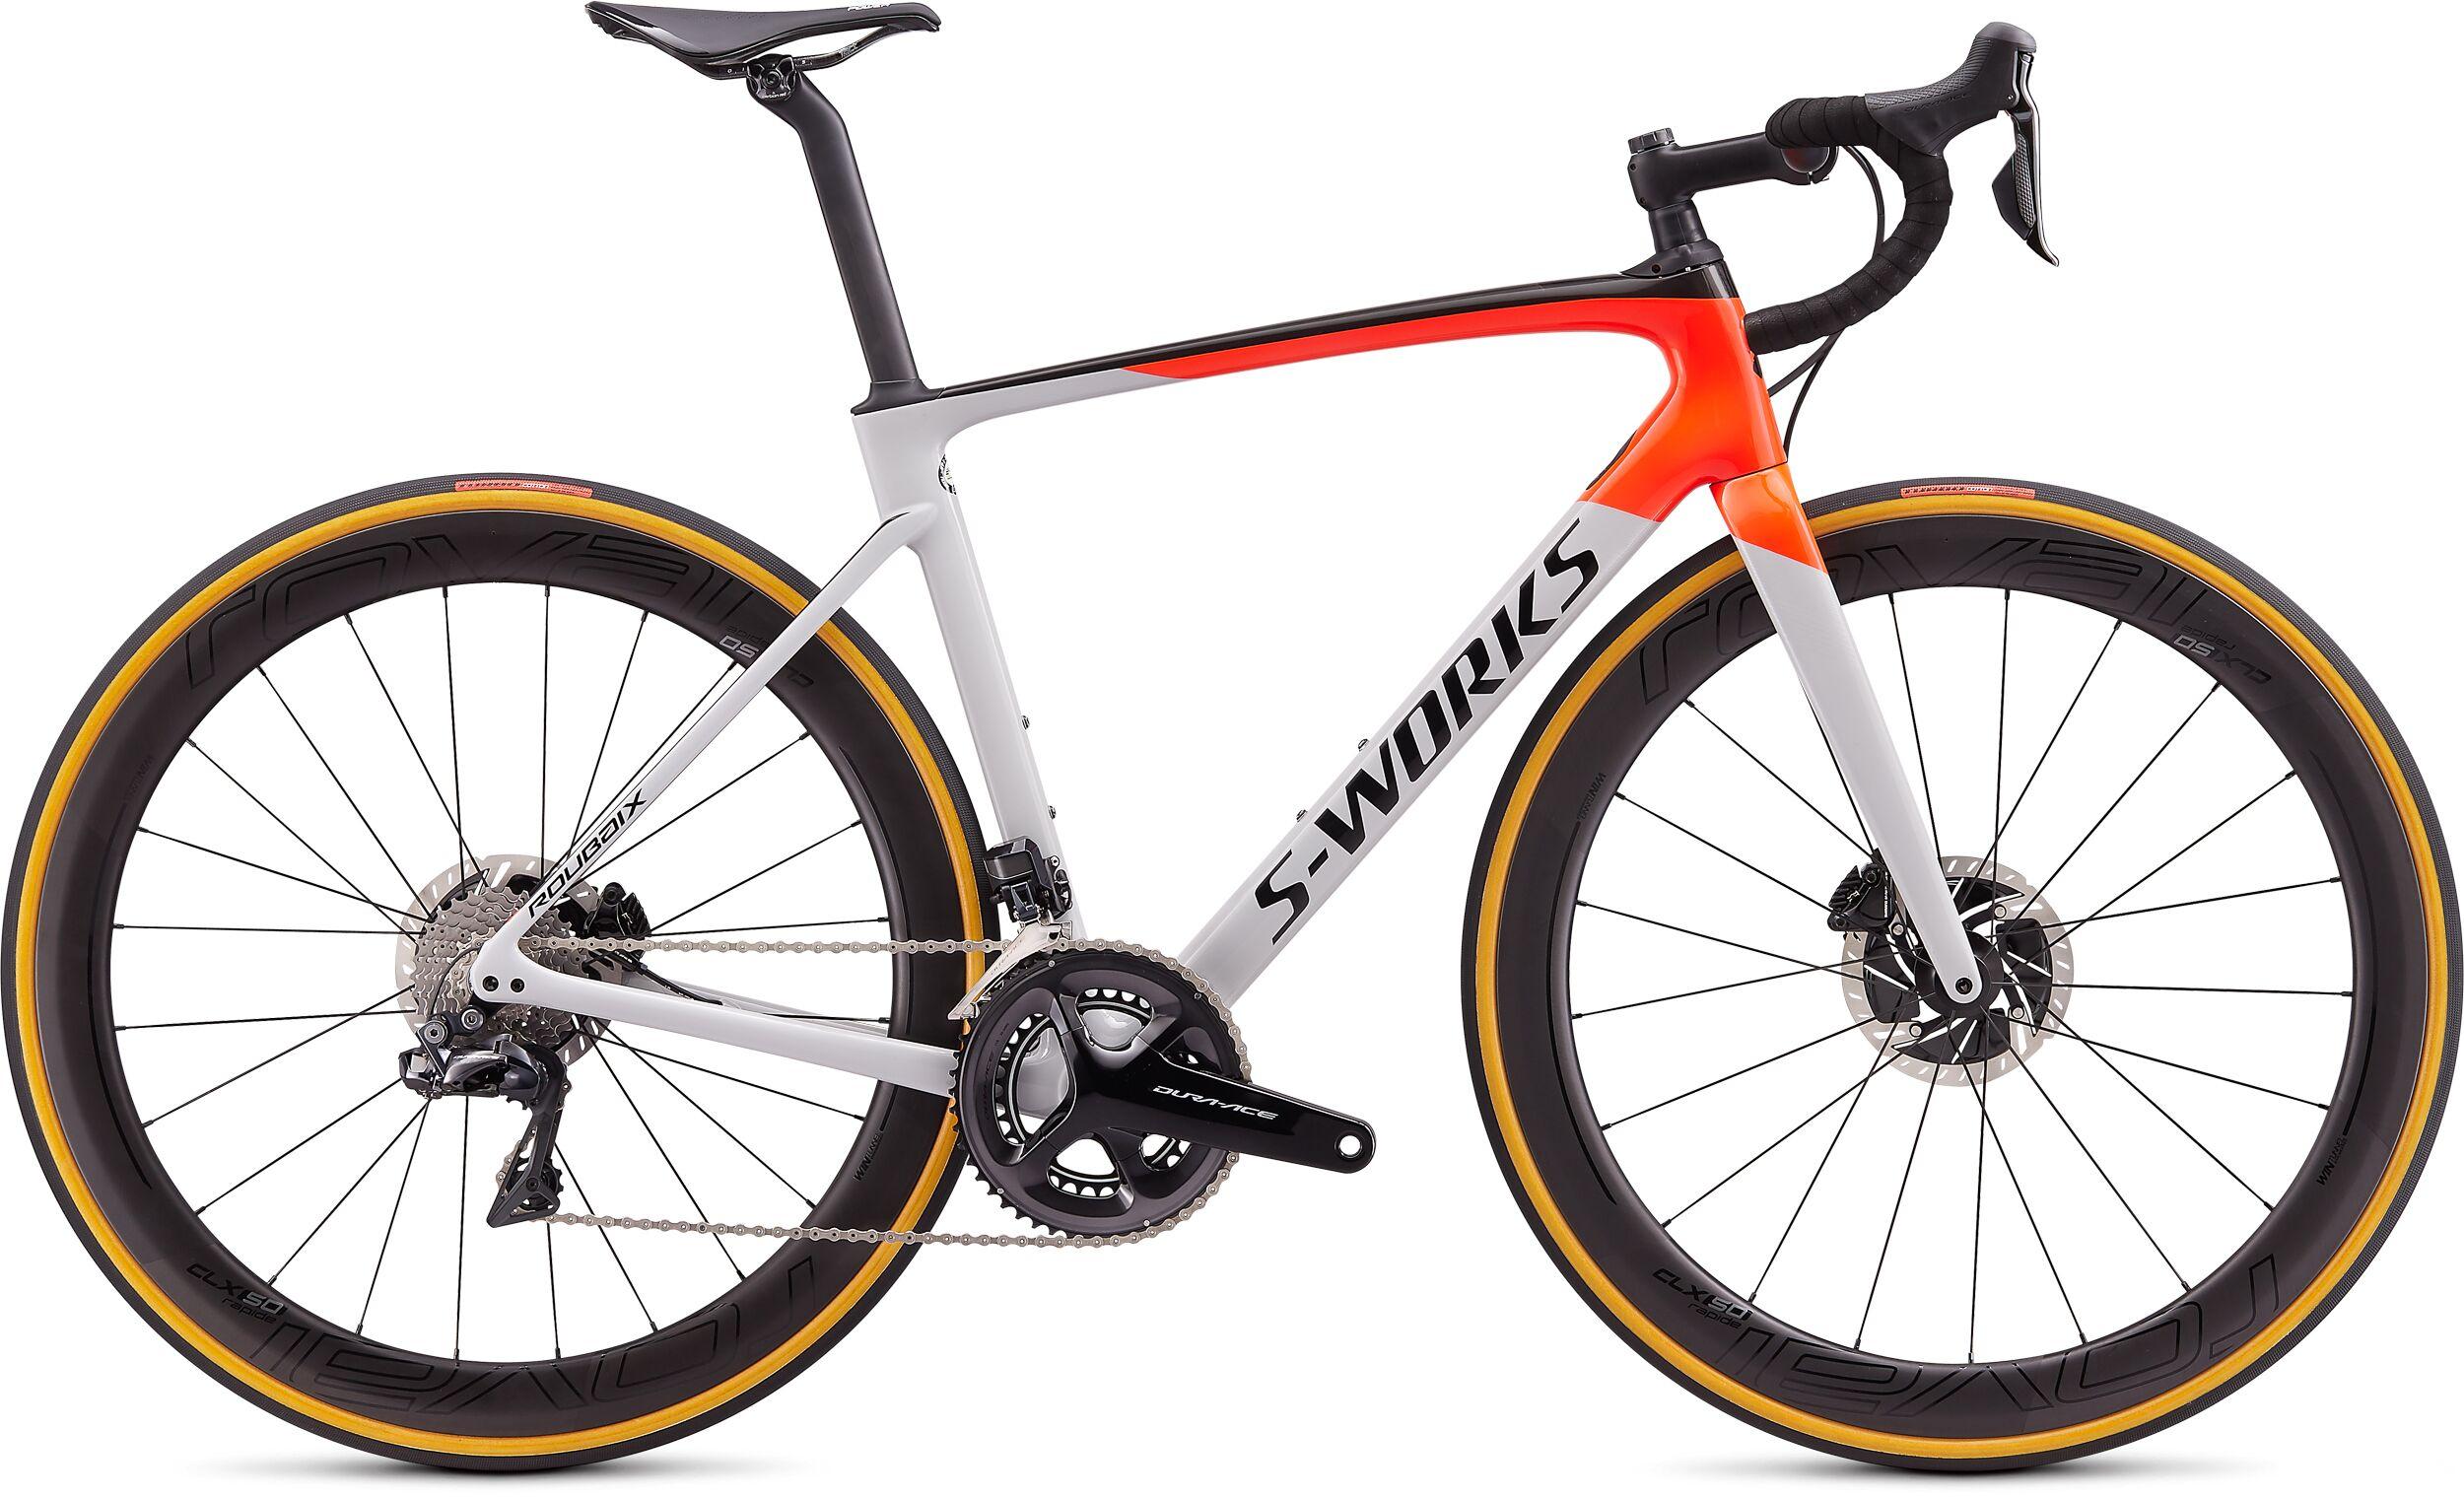 Specialized SWorks Roubaix Dura-Ace DI2 Road Bike 2020 Dove Gray/Red